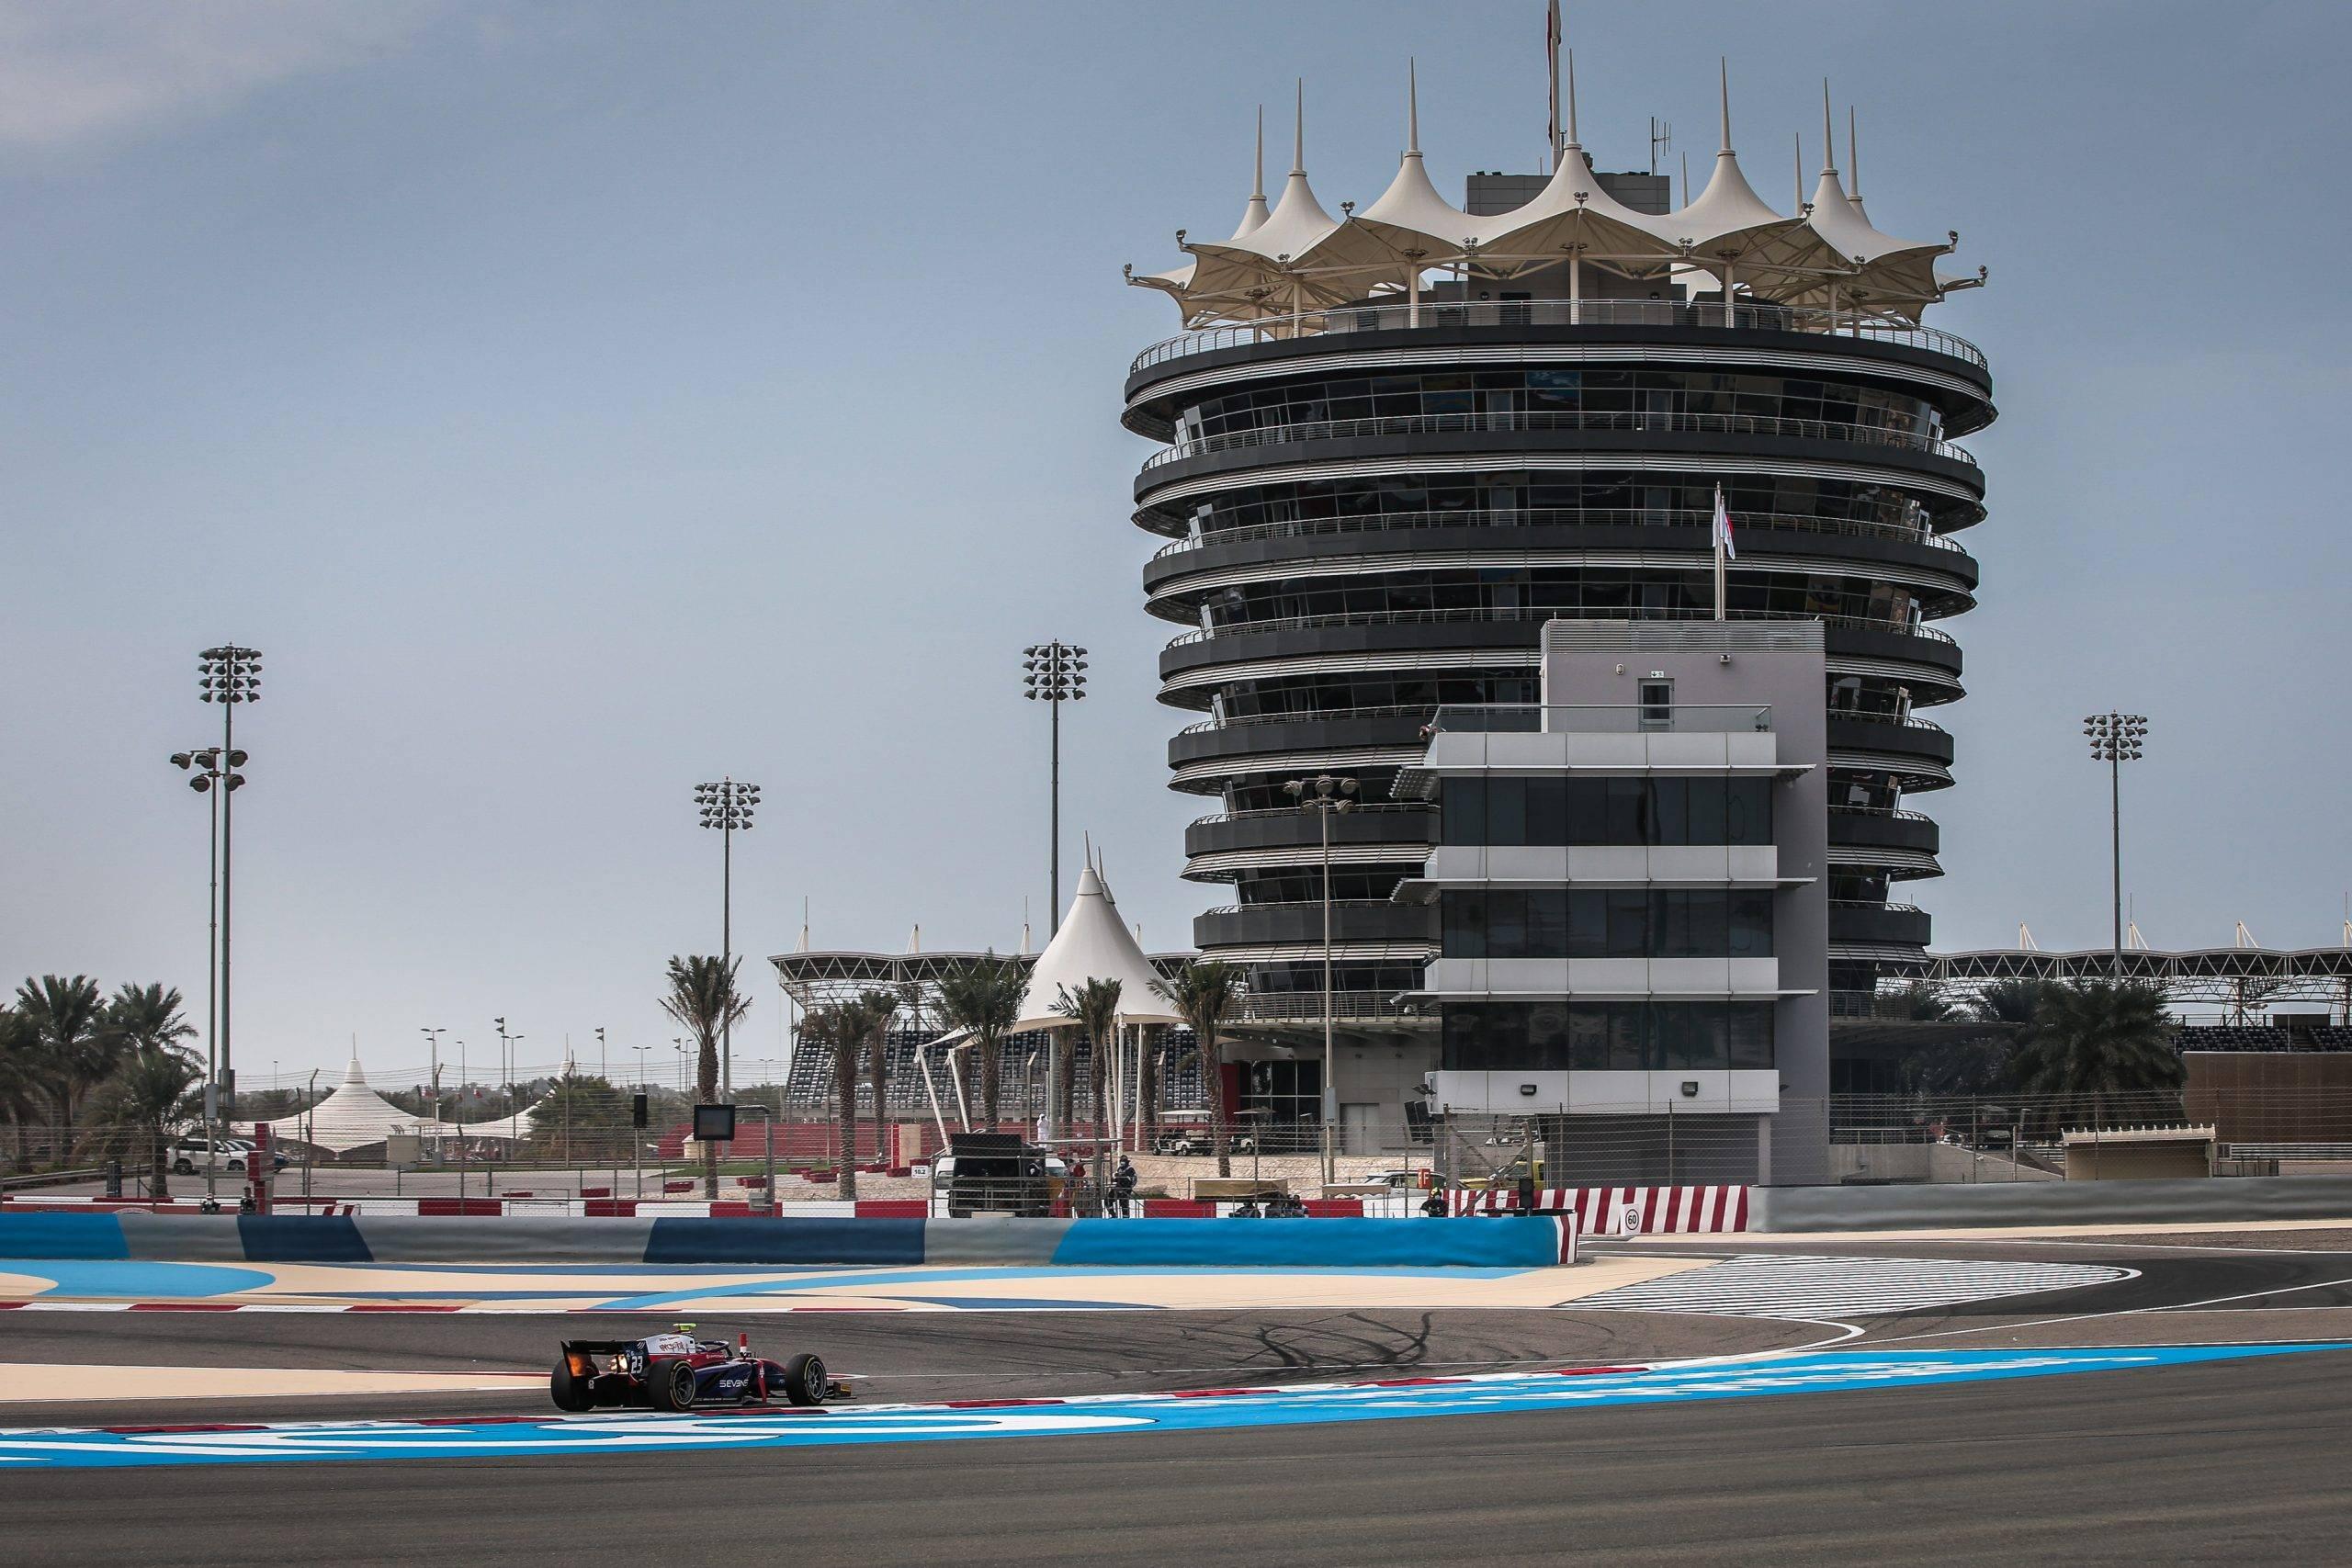 Sakhir (BAH) Nov 27-29, 2020 - F2 Gulf Air Bahrain GP 2020 at Bahrain International Circuit. Marino Sato #23 Trident. © 2020 Diederik van der Laan / Dutch Photo Agency